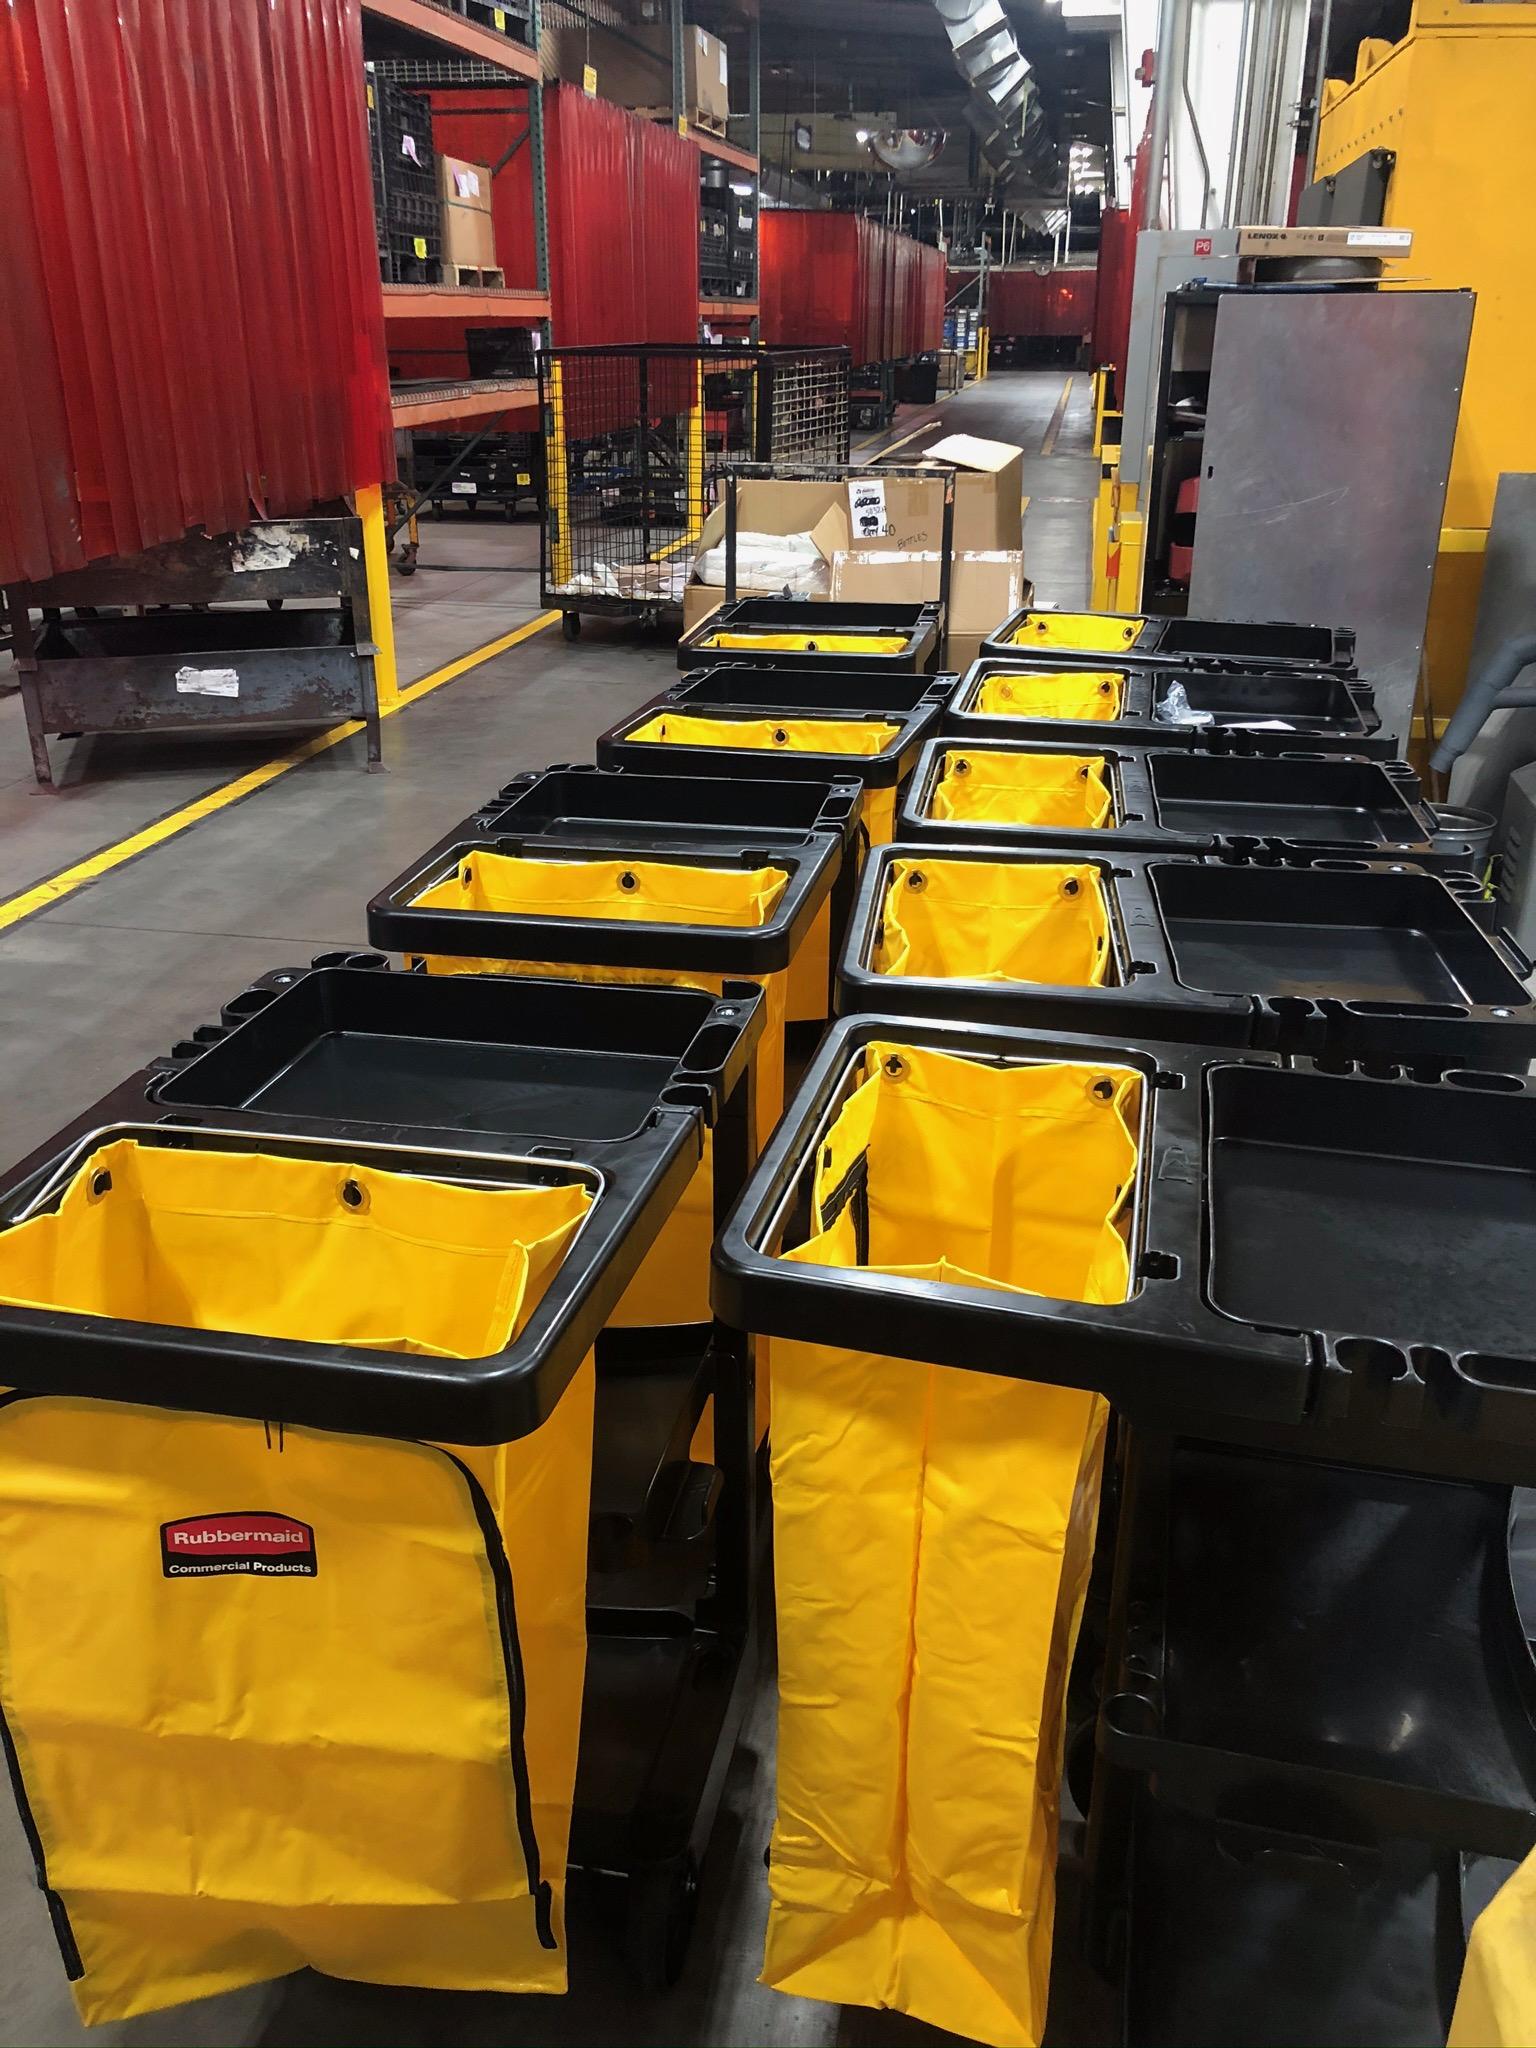 Cleaning Supplies at Polaris Facility